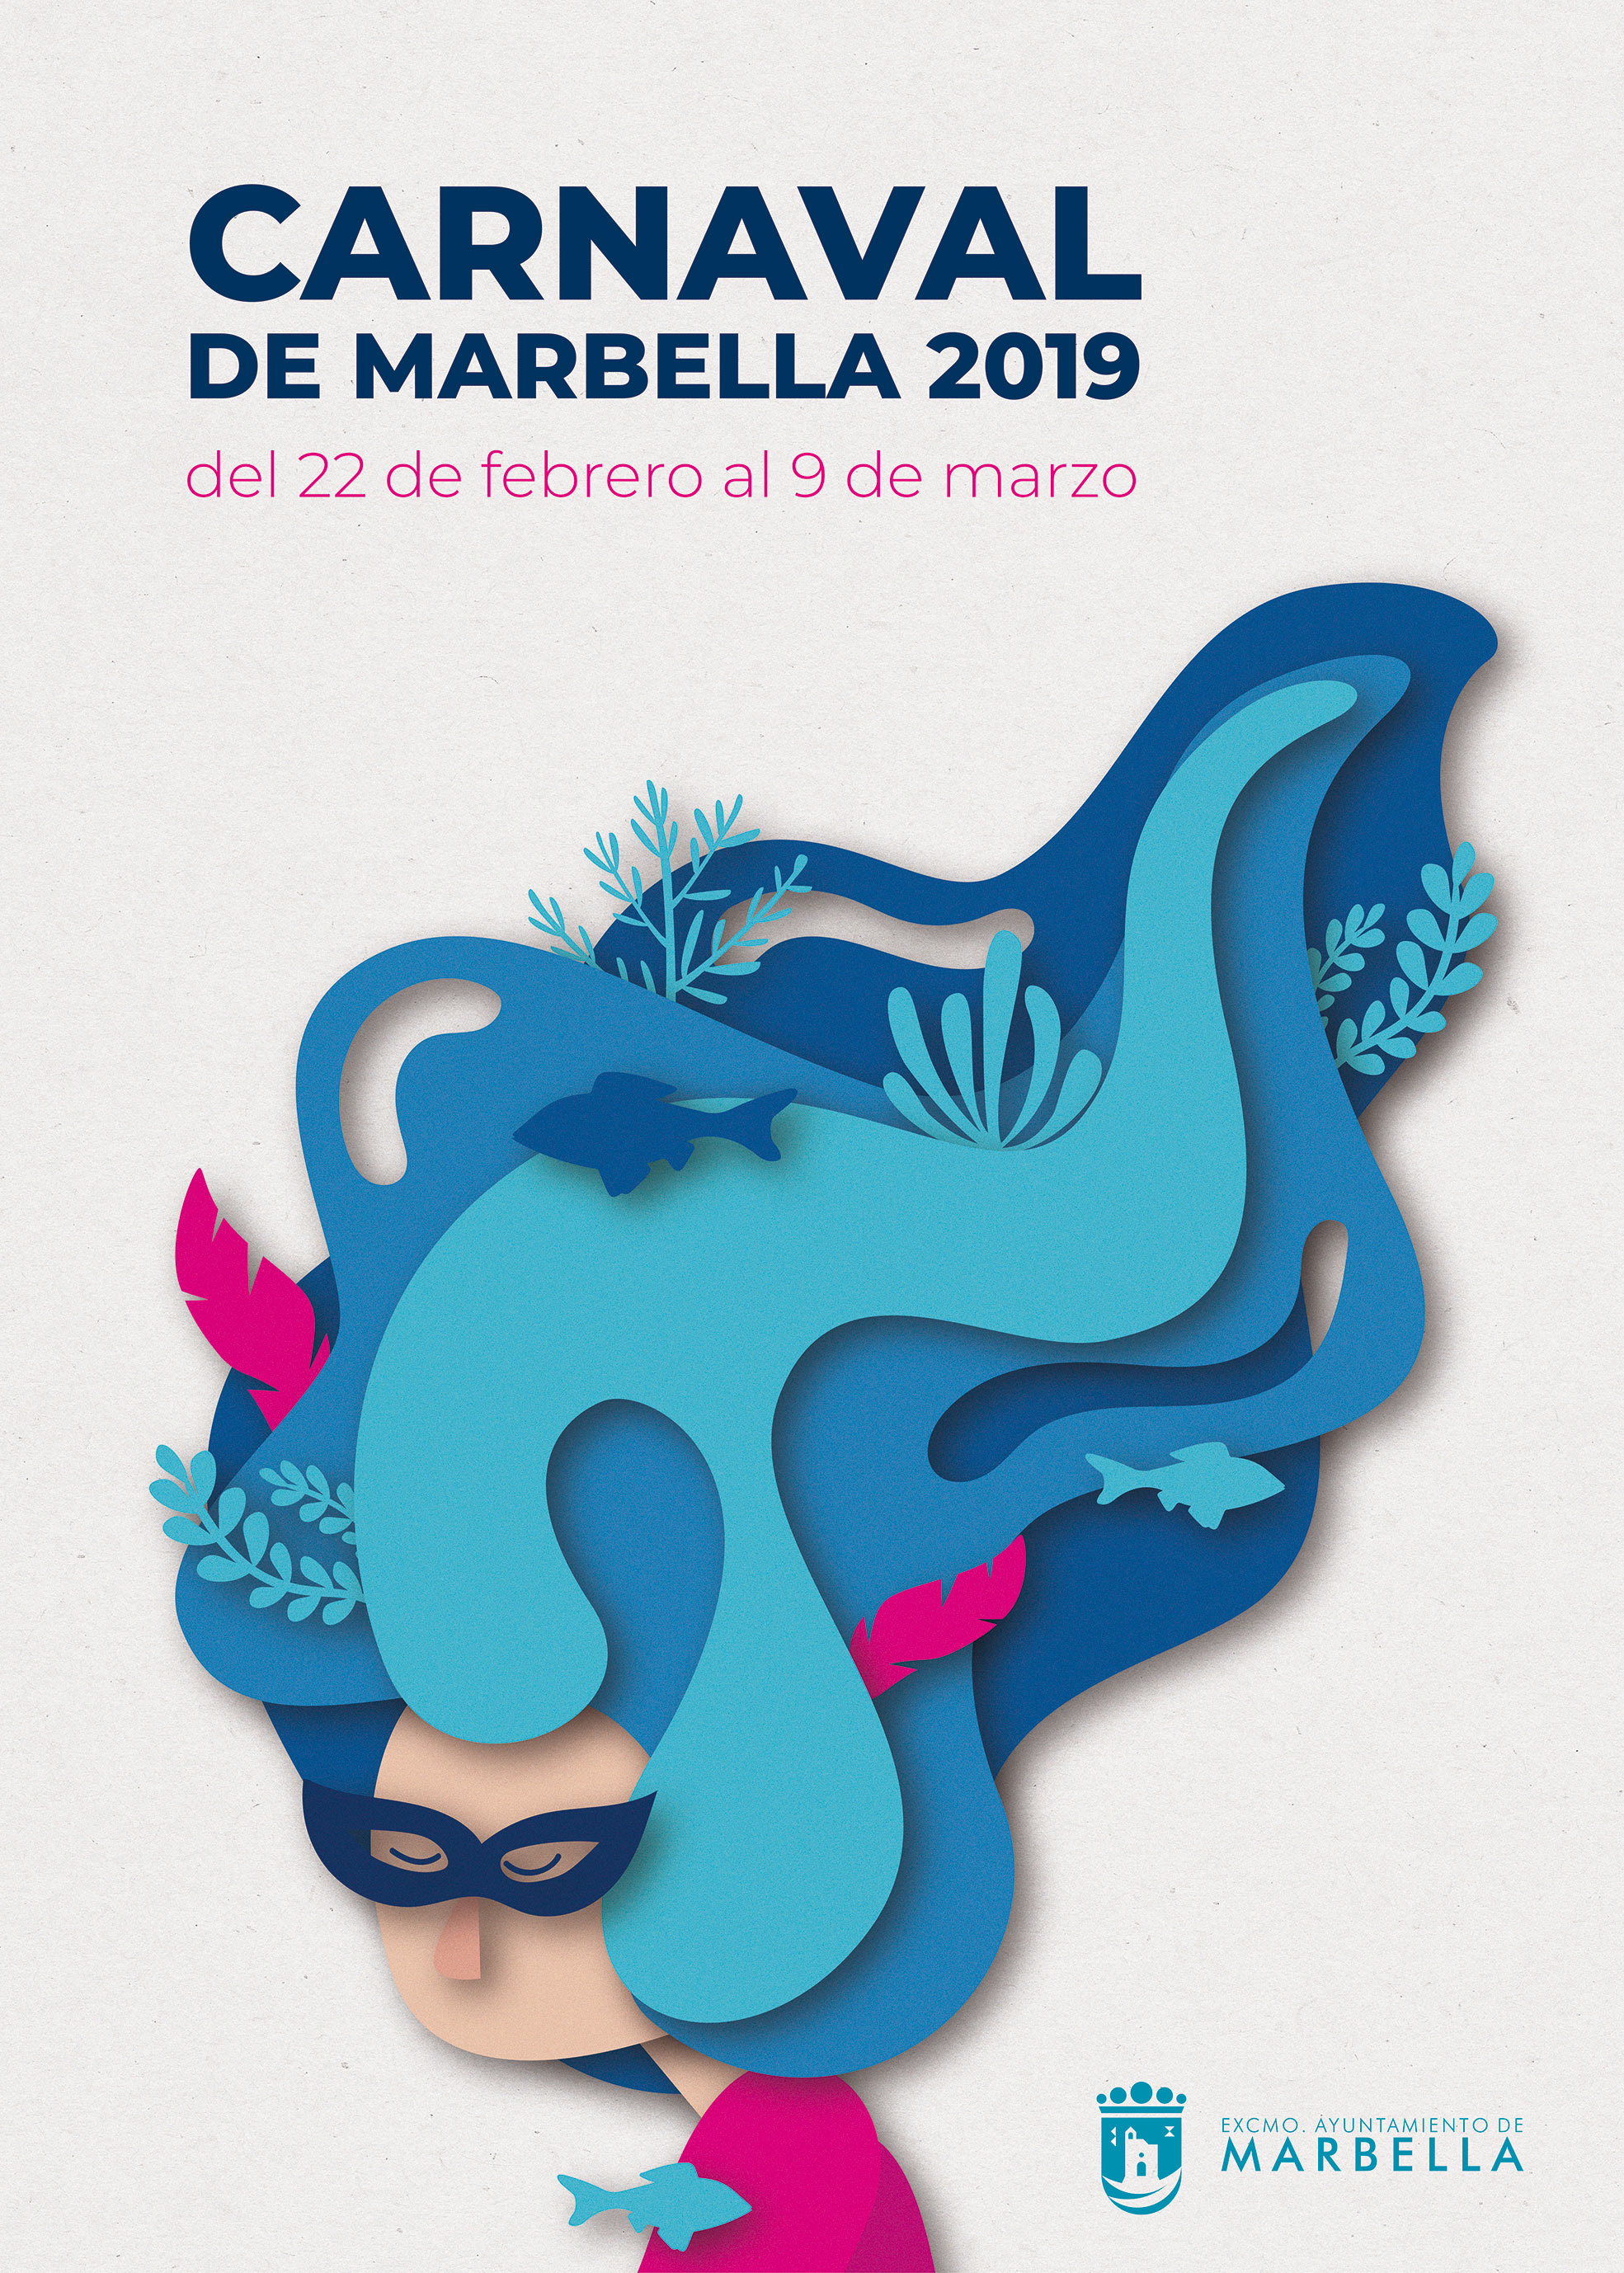 Carnaval Marbella 2019 - Centro Comercial Centro Plaza